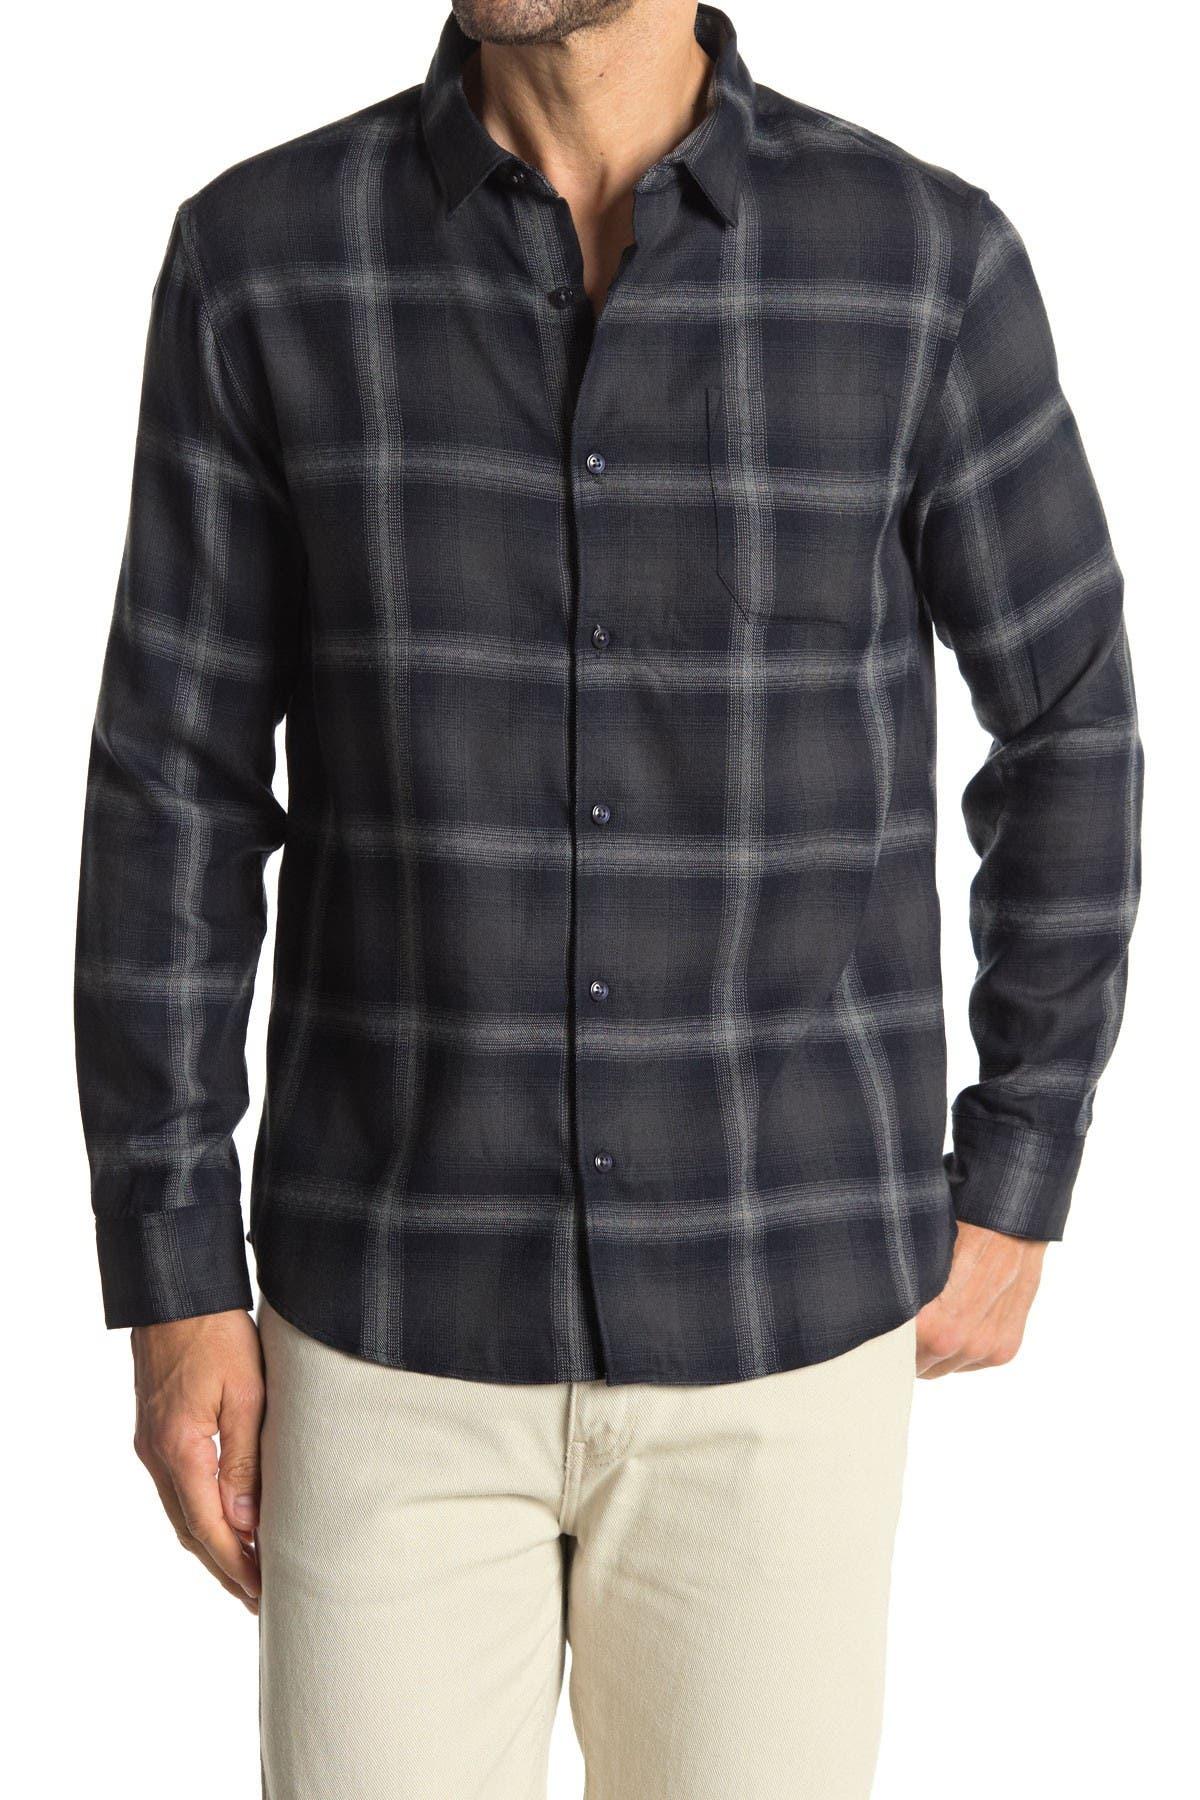 Image of 7 Diamonds Broken Halo Plaid Flannel Slim Fit Shirt